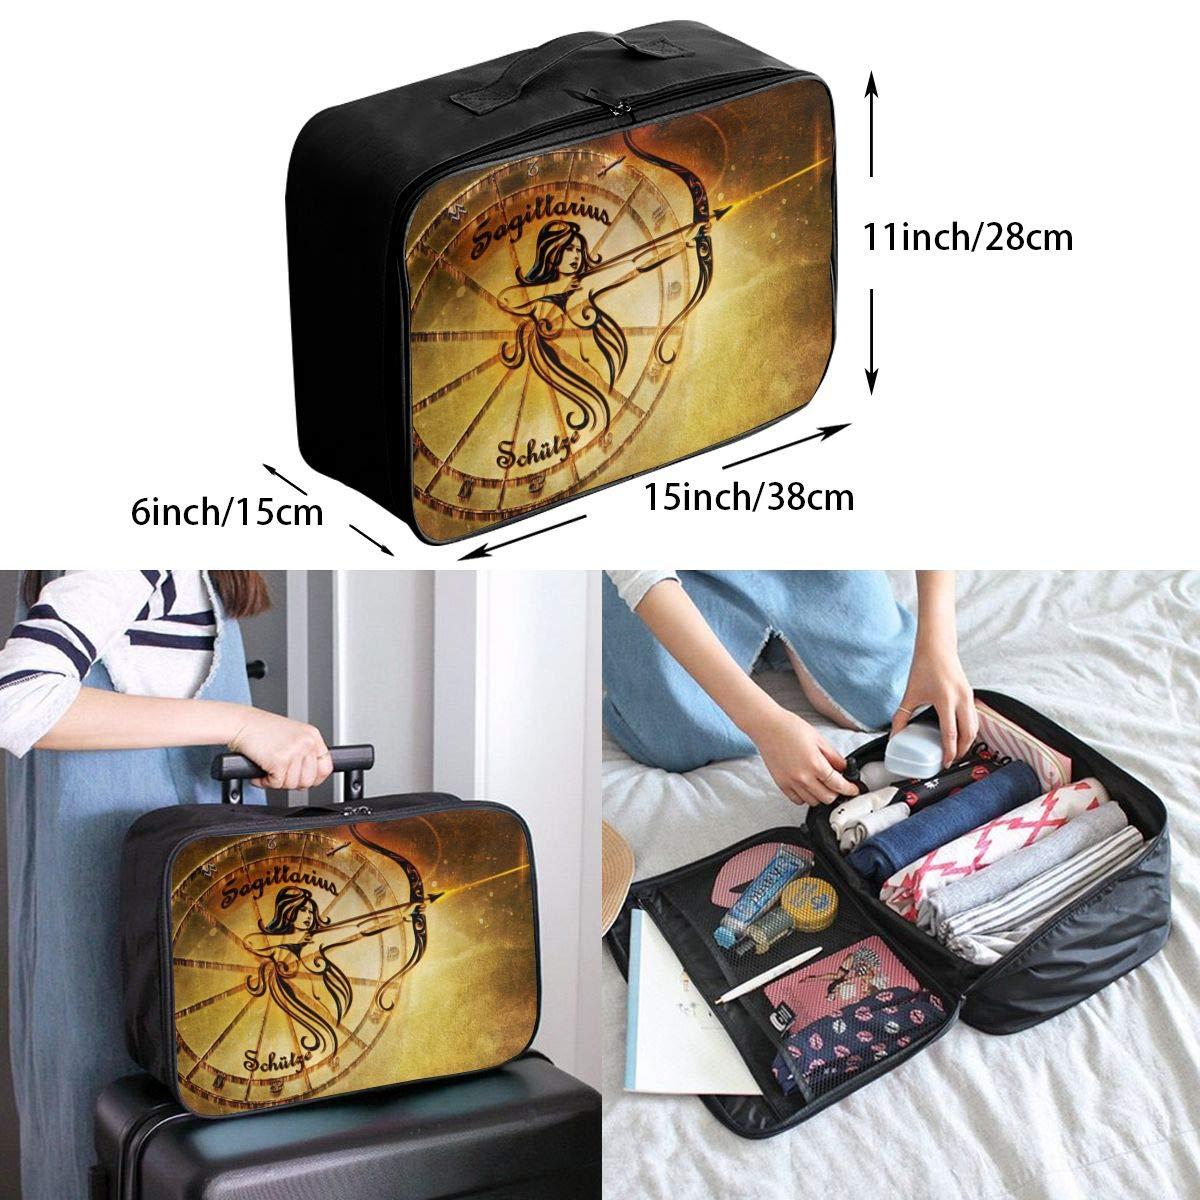 ADGAI Constellation Sagittarius Canvas Travel Weekender Bag,Fashion Custom Lightweight Large Capacity Portable Luggage Bag,Suitcase Trolley Bag